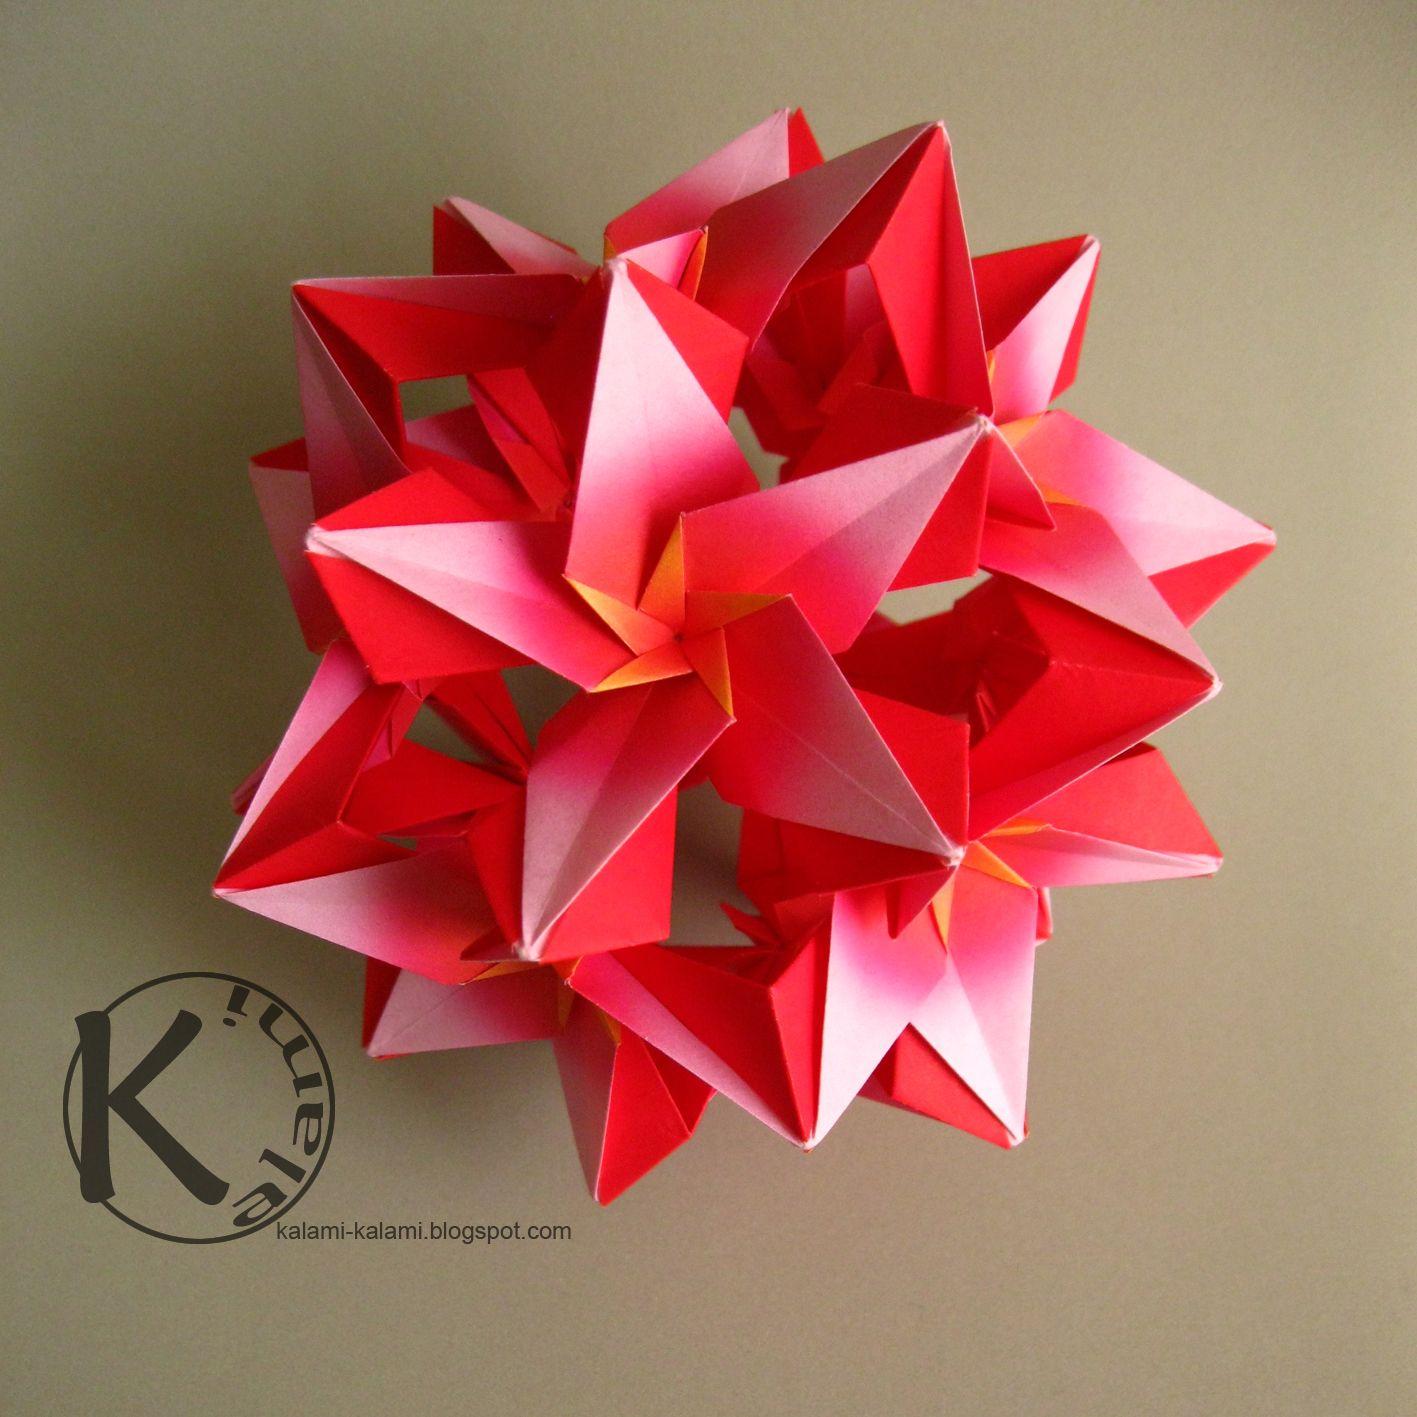 Carmen S Star Globe Par Kalamic With Images Origami Crafts Origami Paper Art Modular Origami